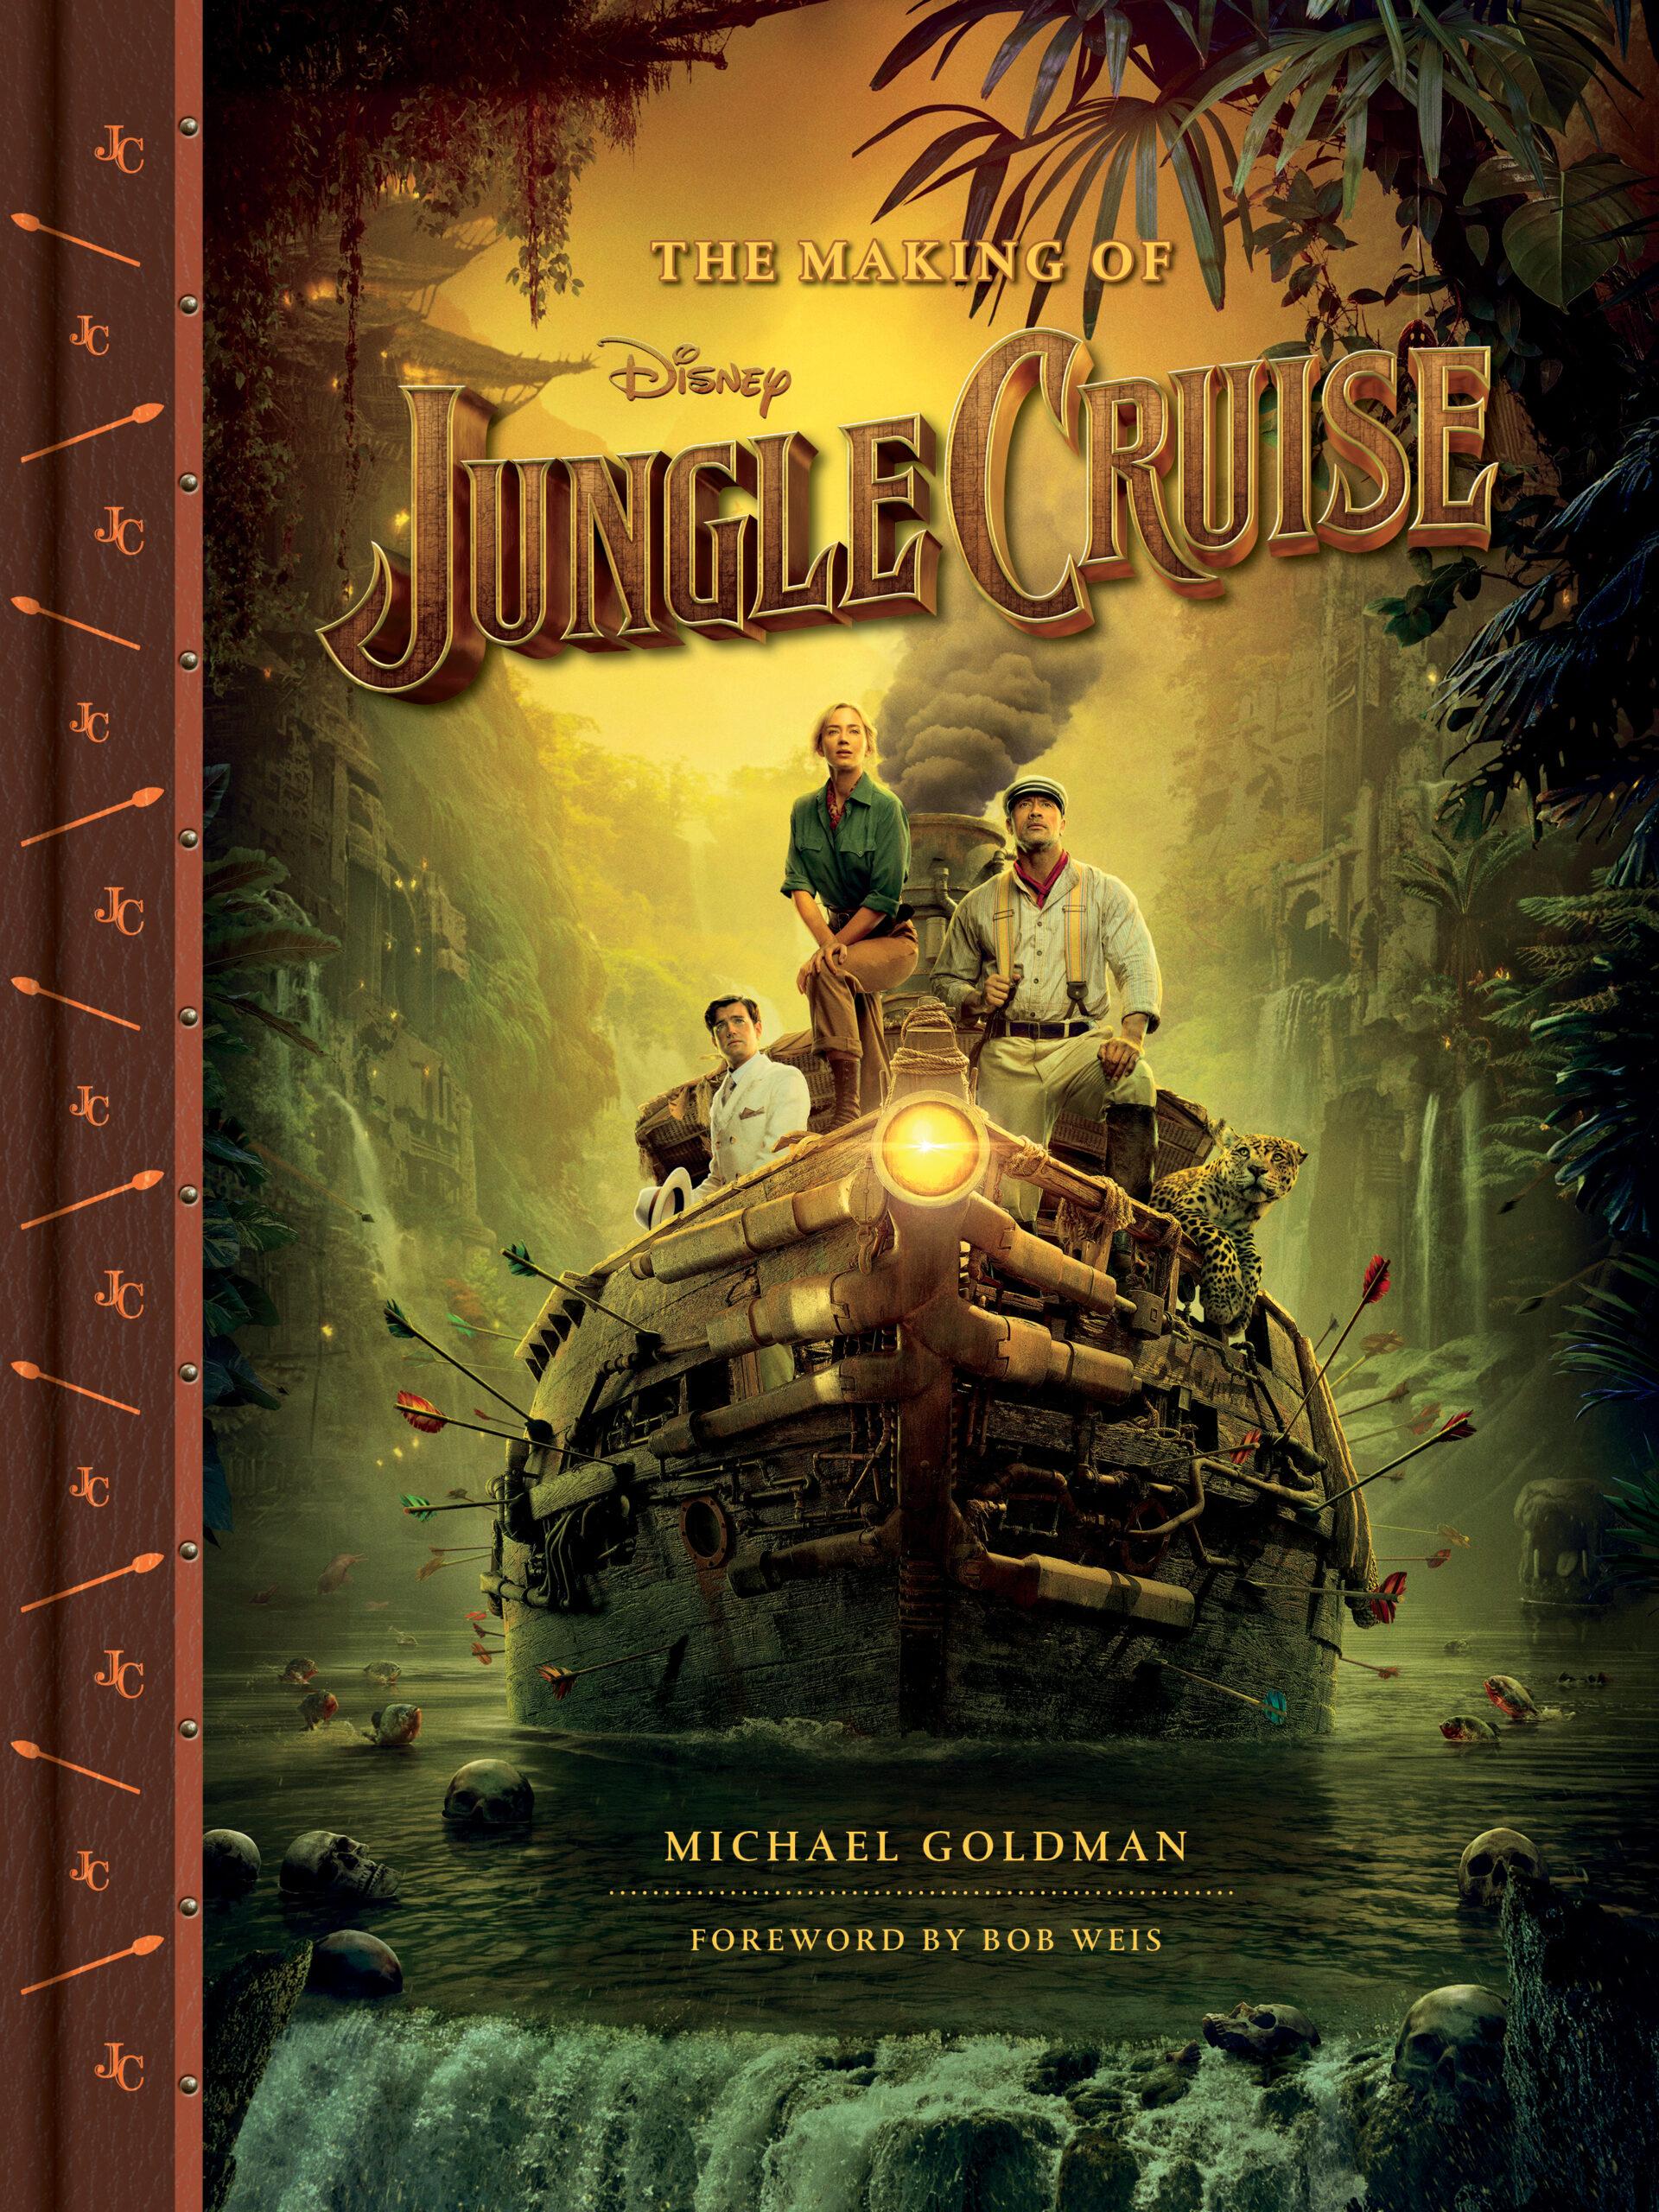 making of jungle cruise book